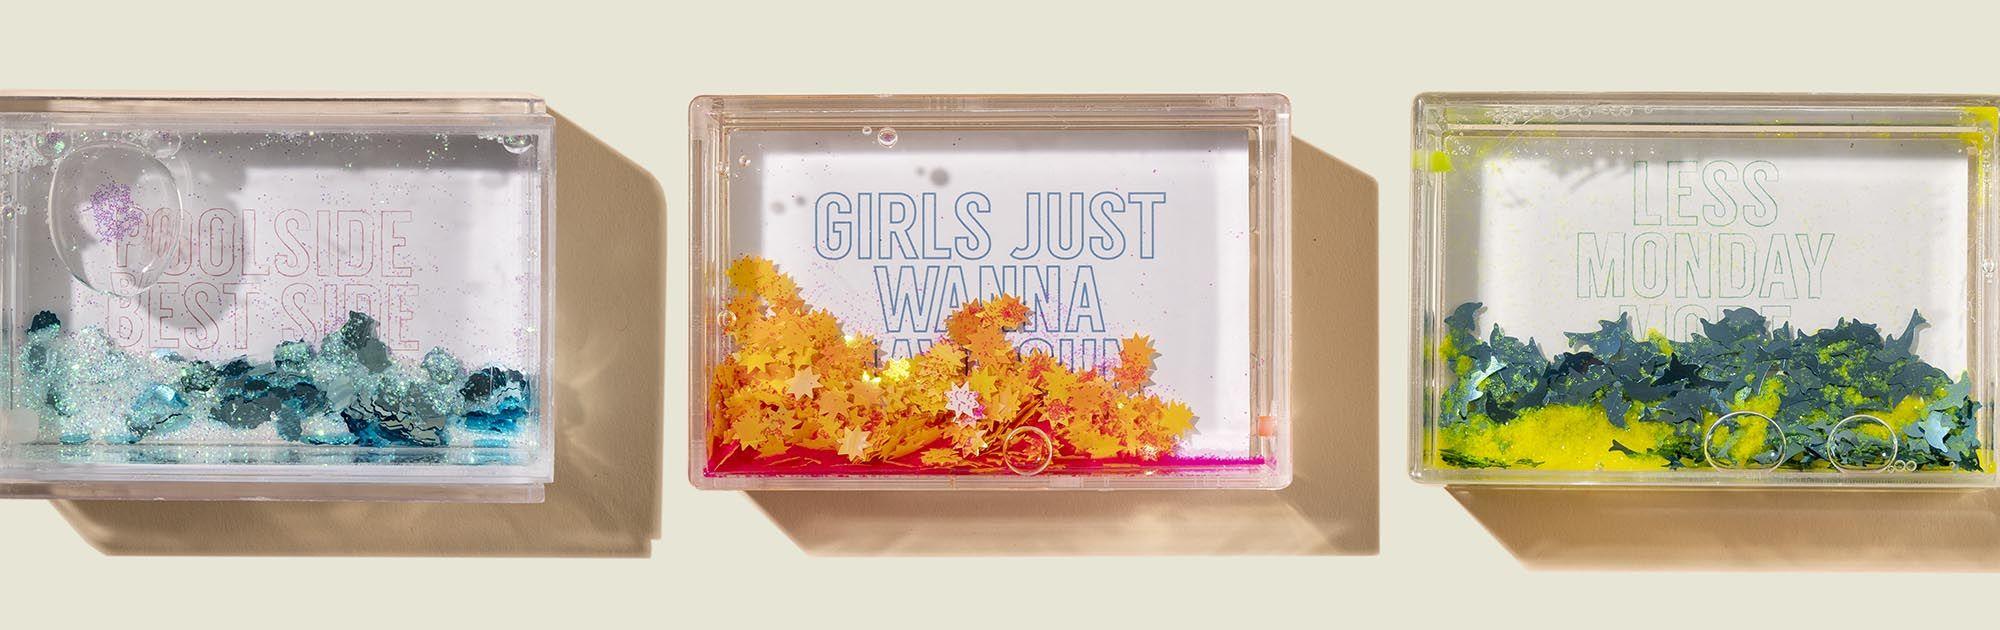 Glitter liquid picture frames